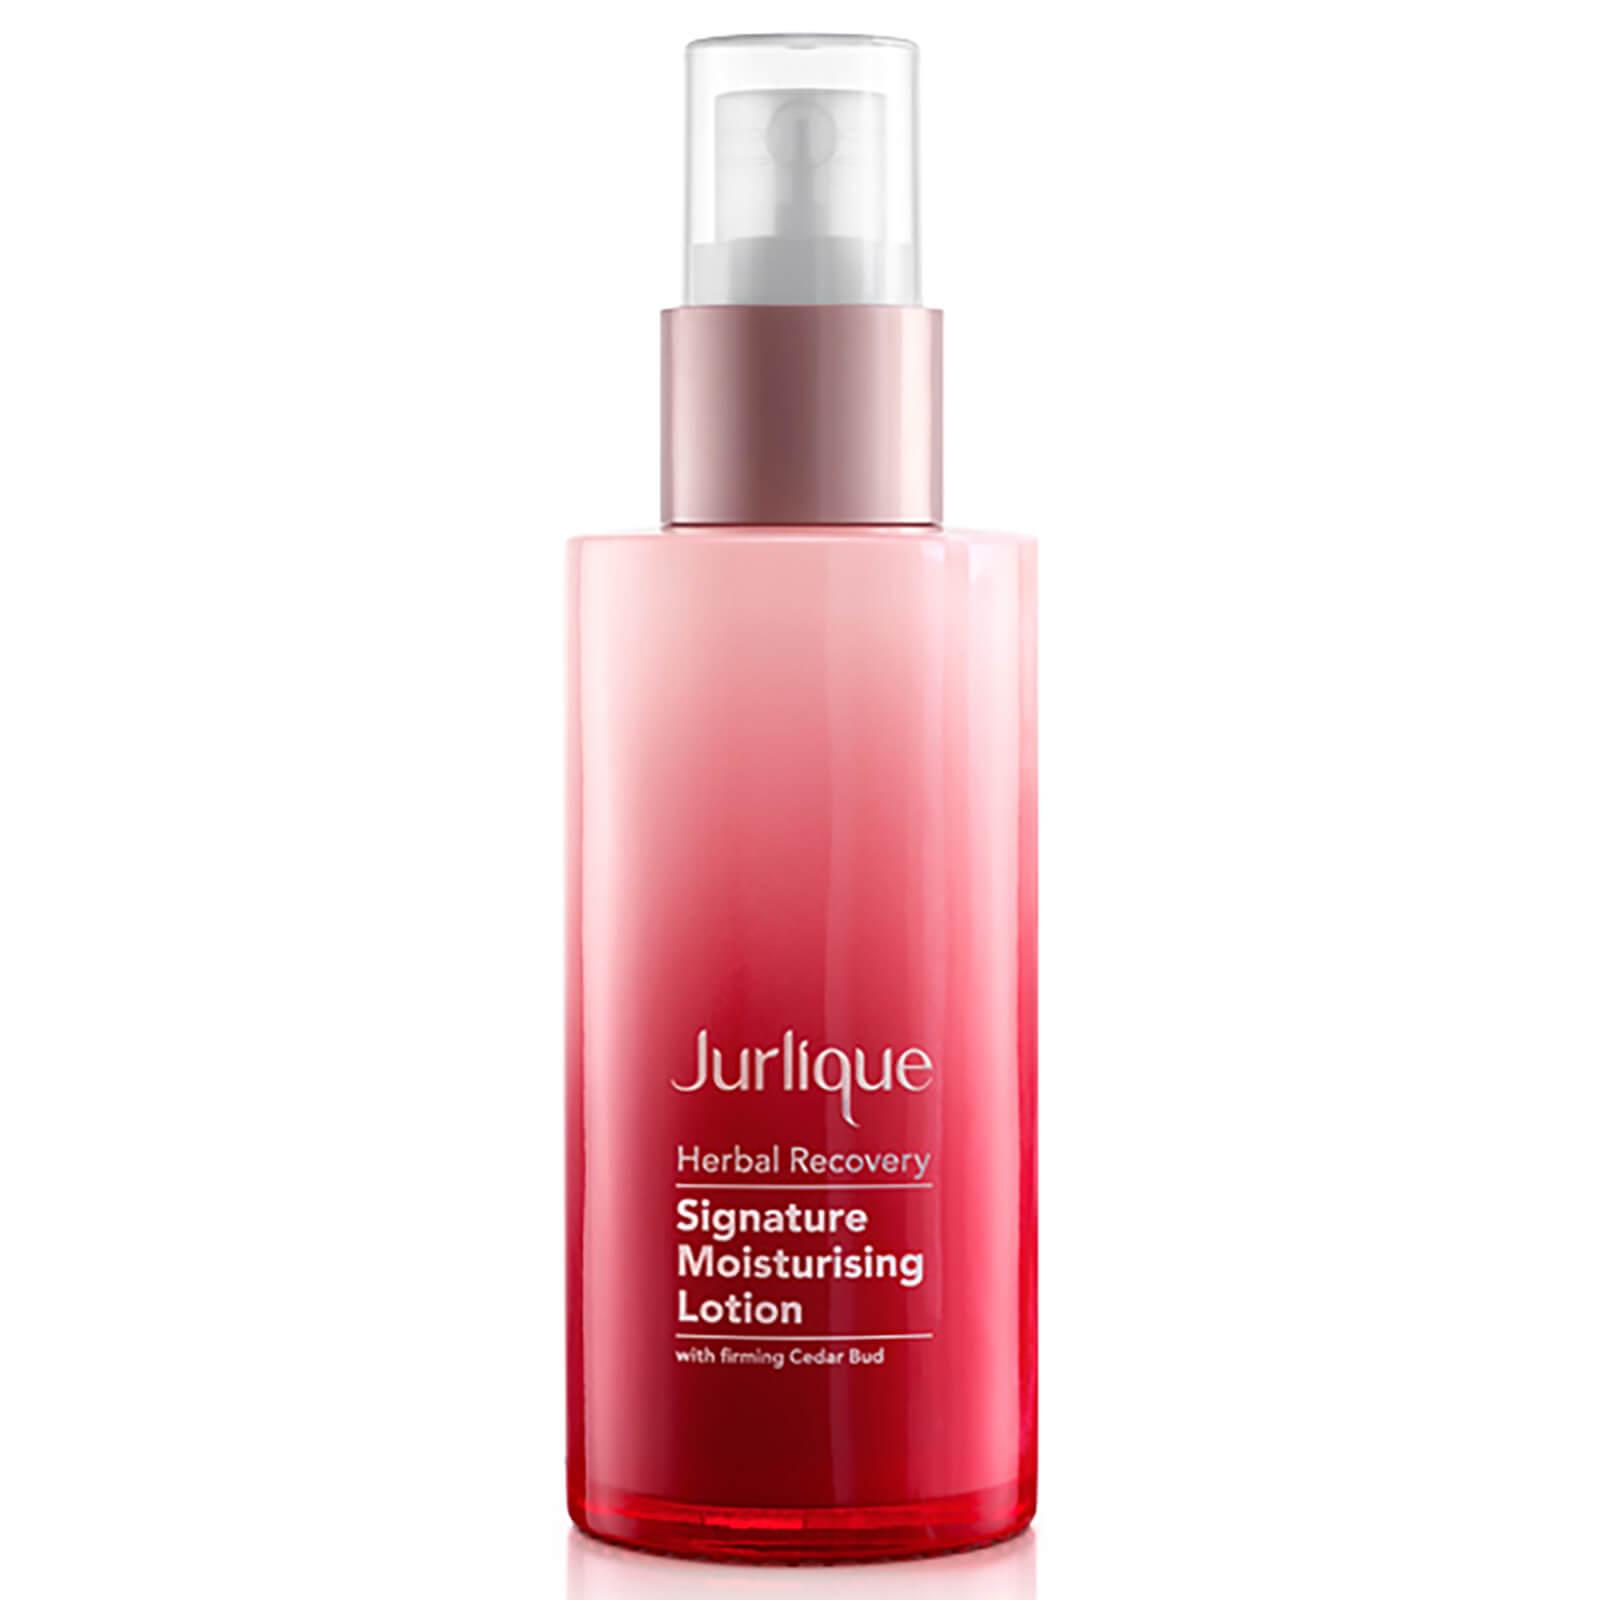 jurlique herbal recovery signature moisturising lotion 50ml